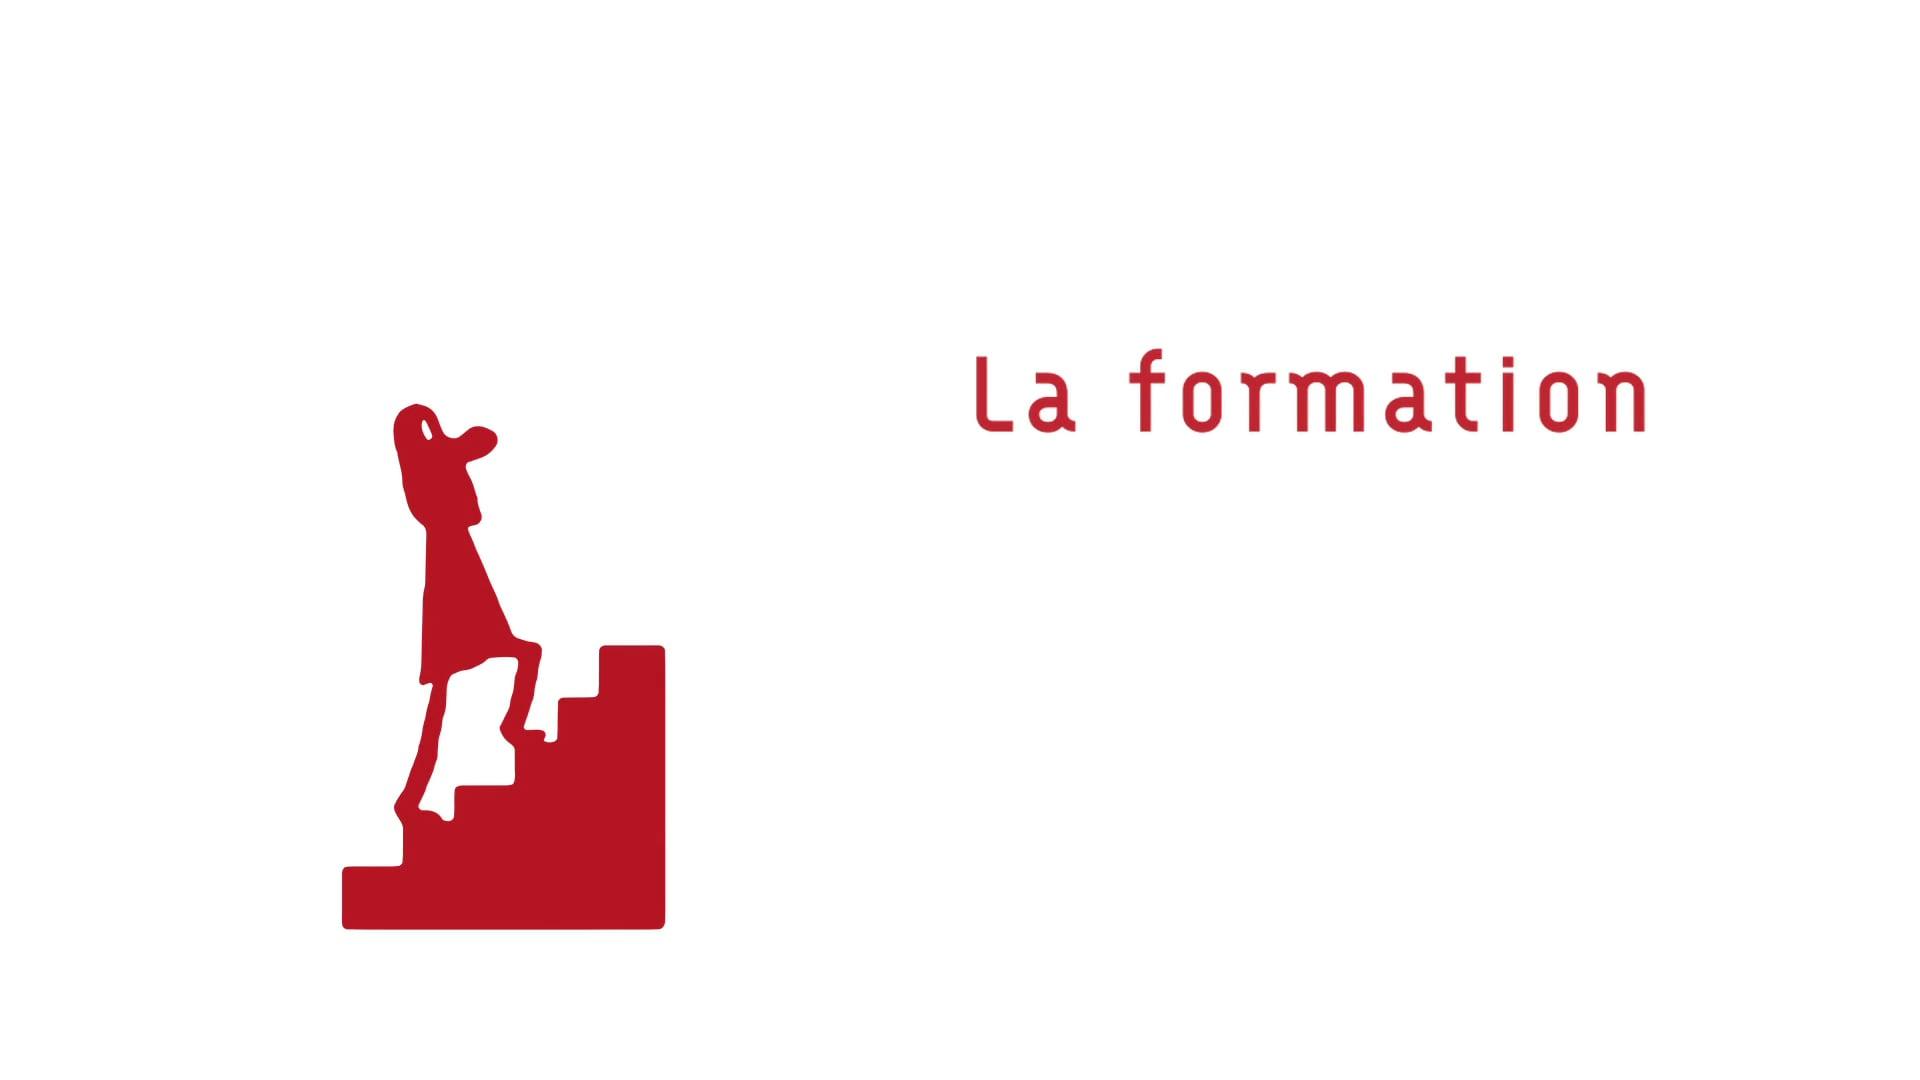 Rachid Ouramdane - La formation